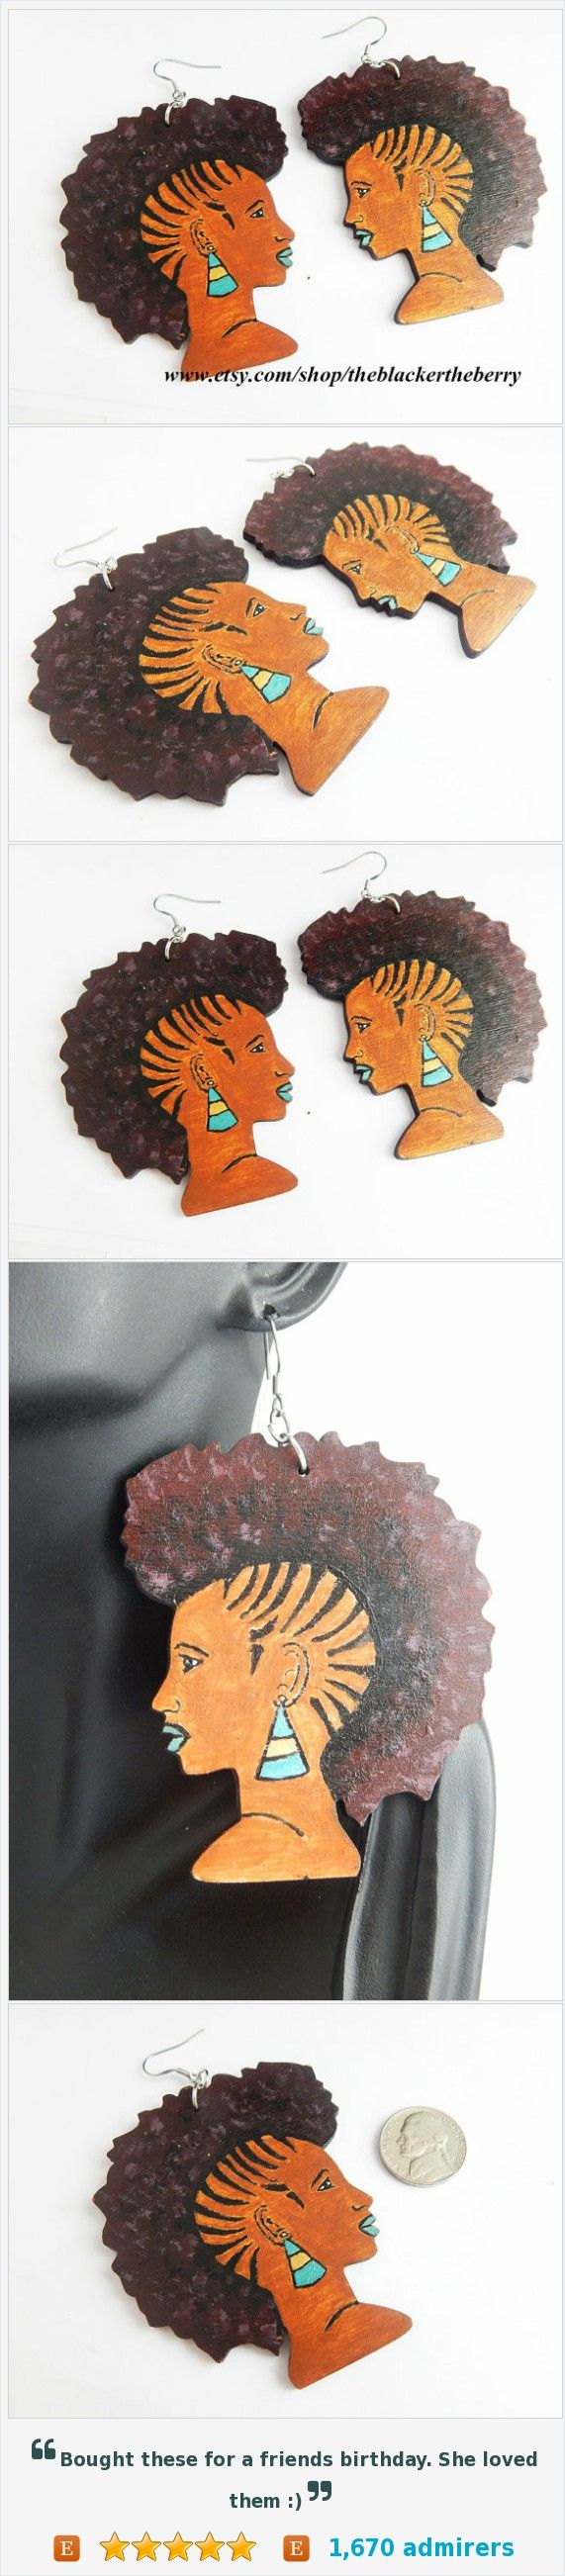 Afropunk Black Girl Rocker Earrings African American Hand Painted Handmade Mohawk Natural Hair Earrings African Wood afro Earring @Sweeterthejuice https://www.etsy.com/listing/451438160/